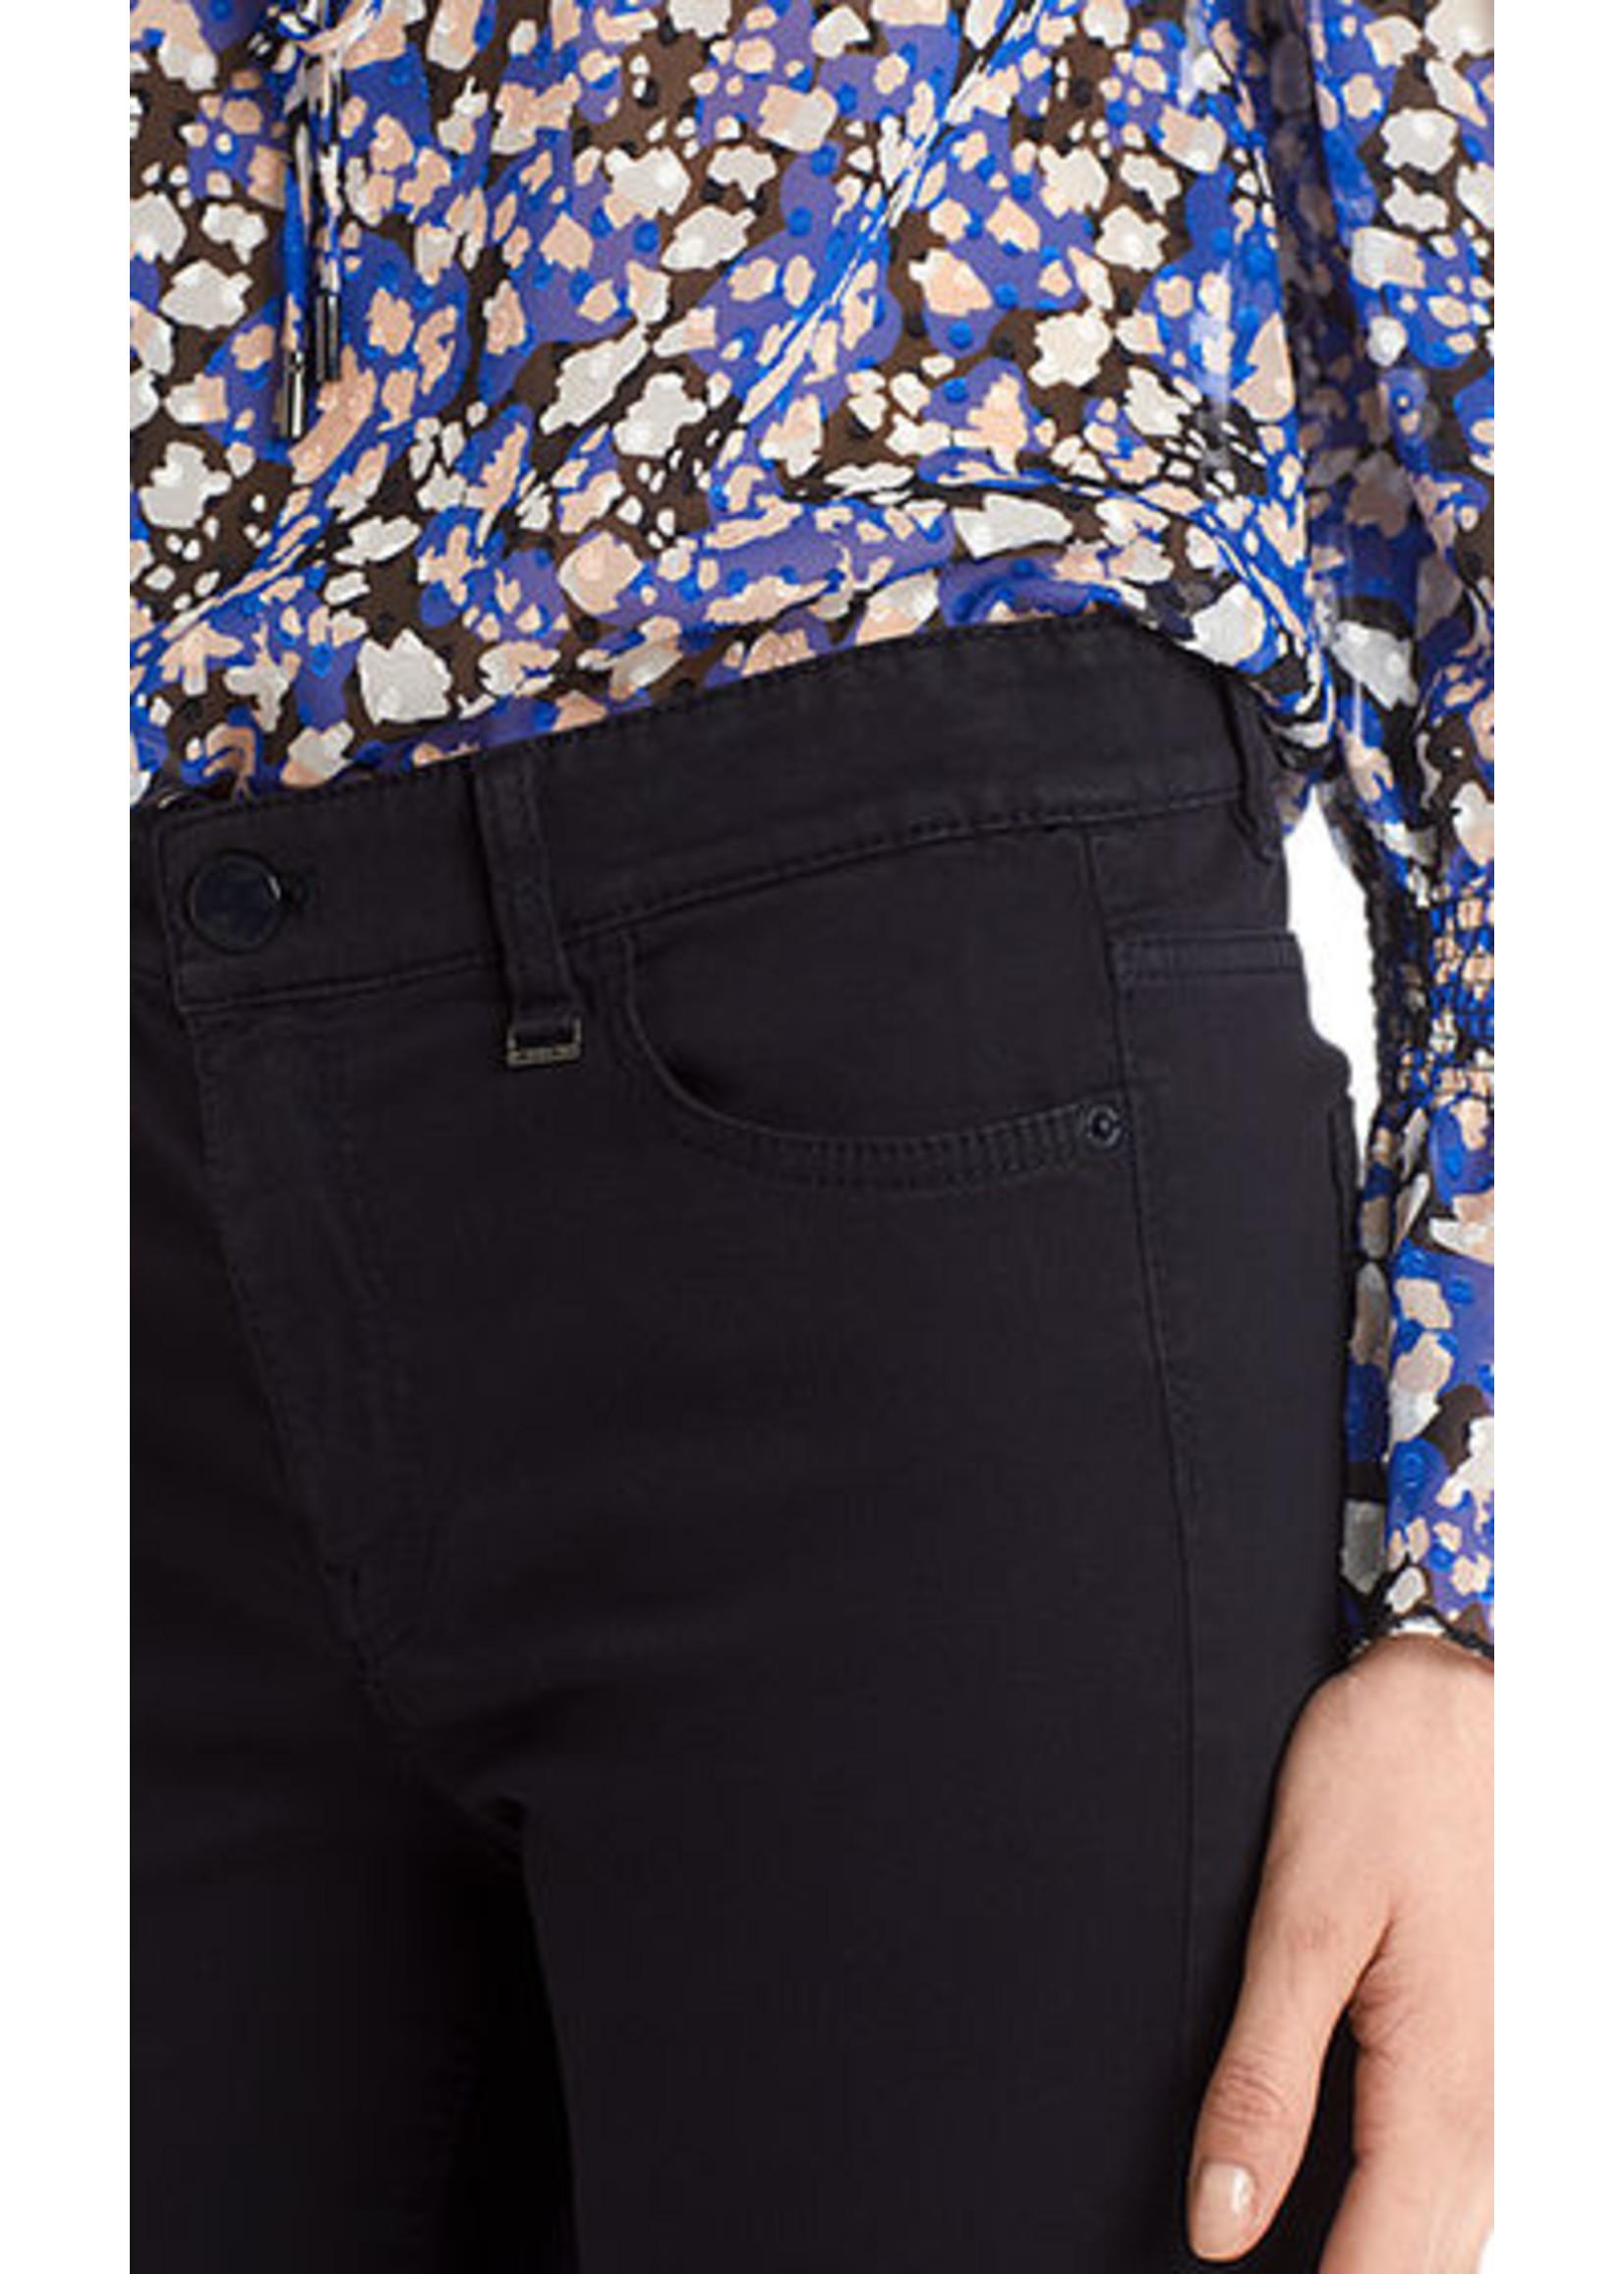 Jeans RC 82.08 D03 midnight blue